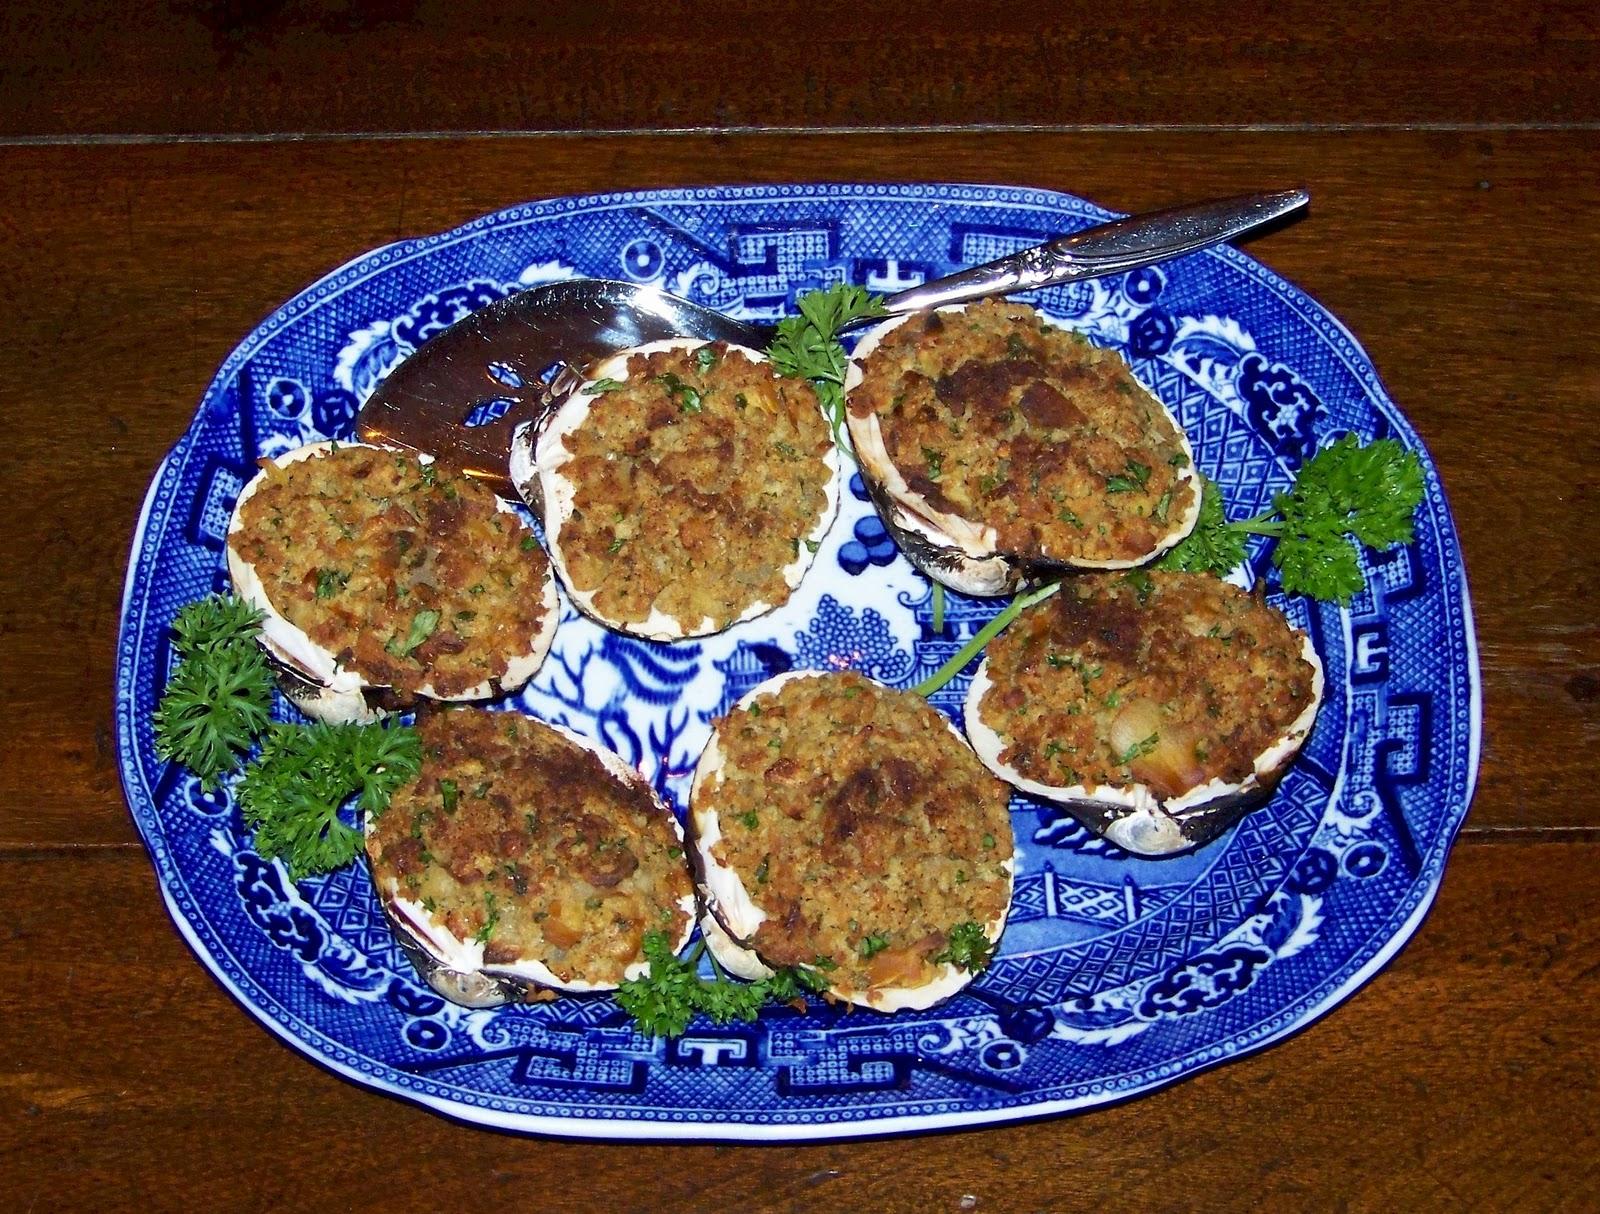 Good Hearty Food: Stuffed Clams (Baked)